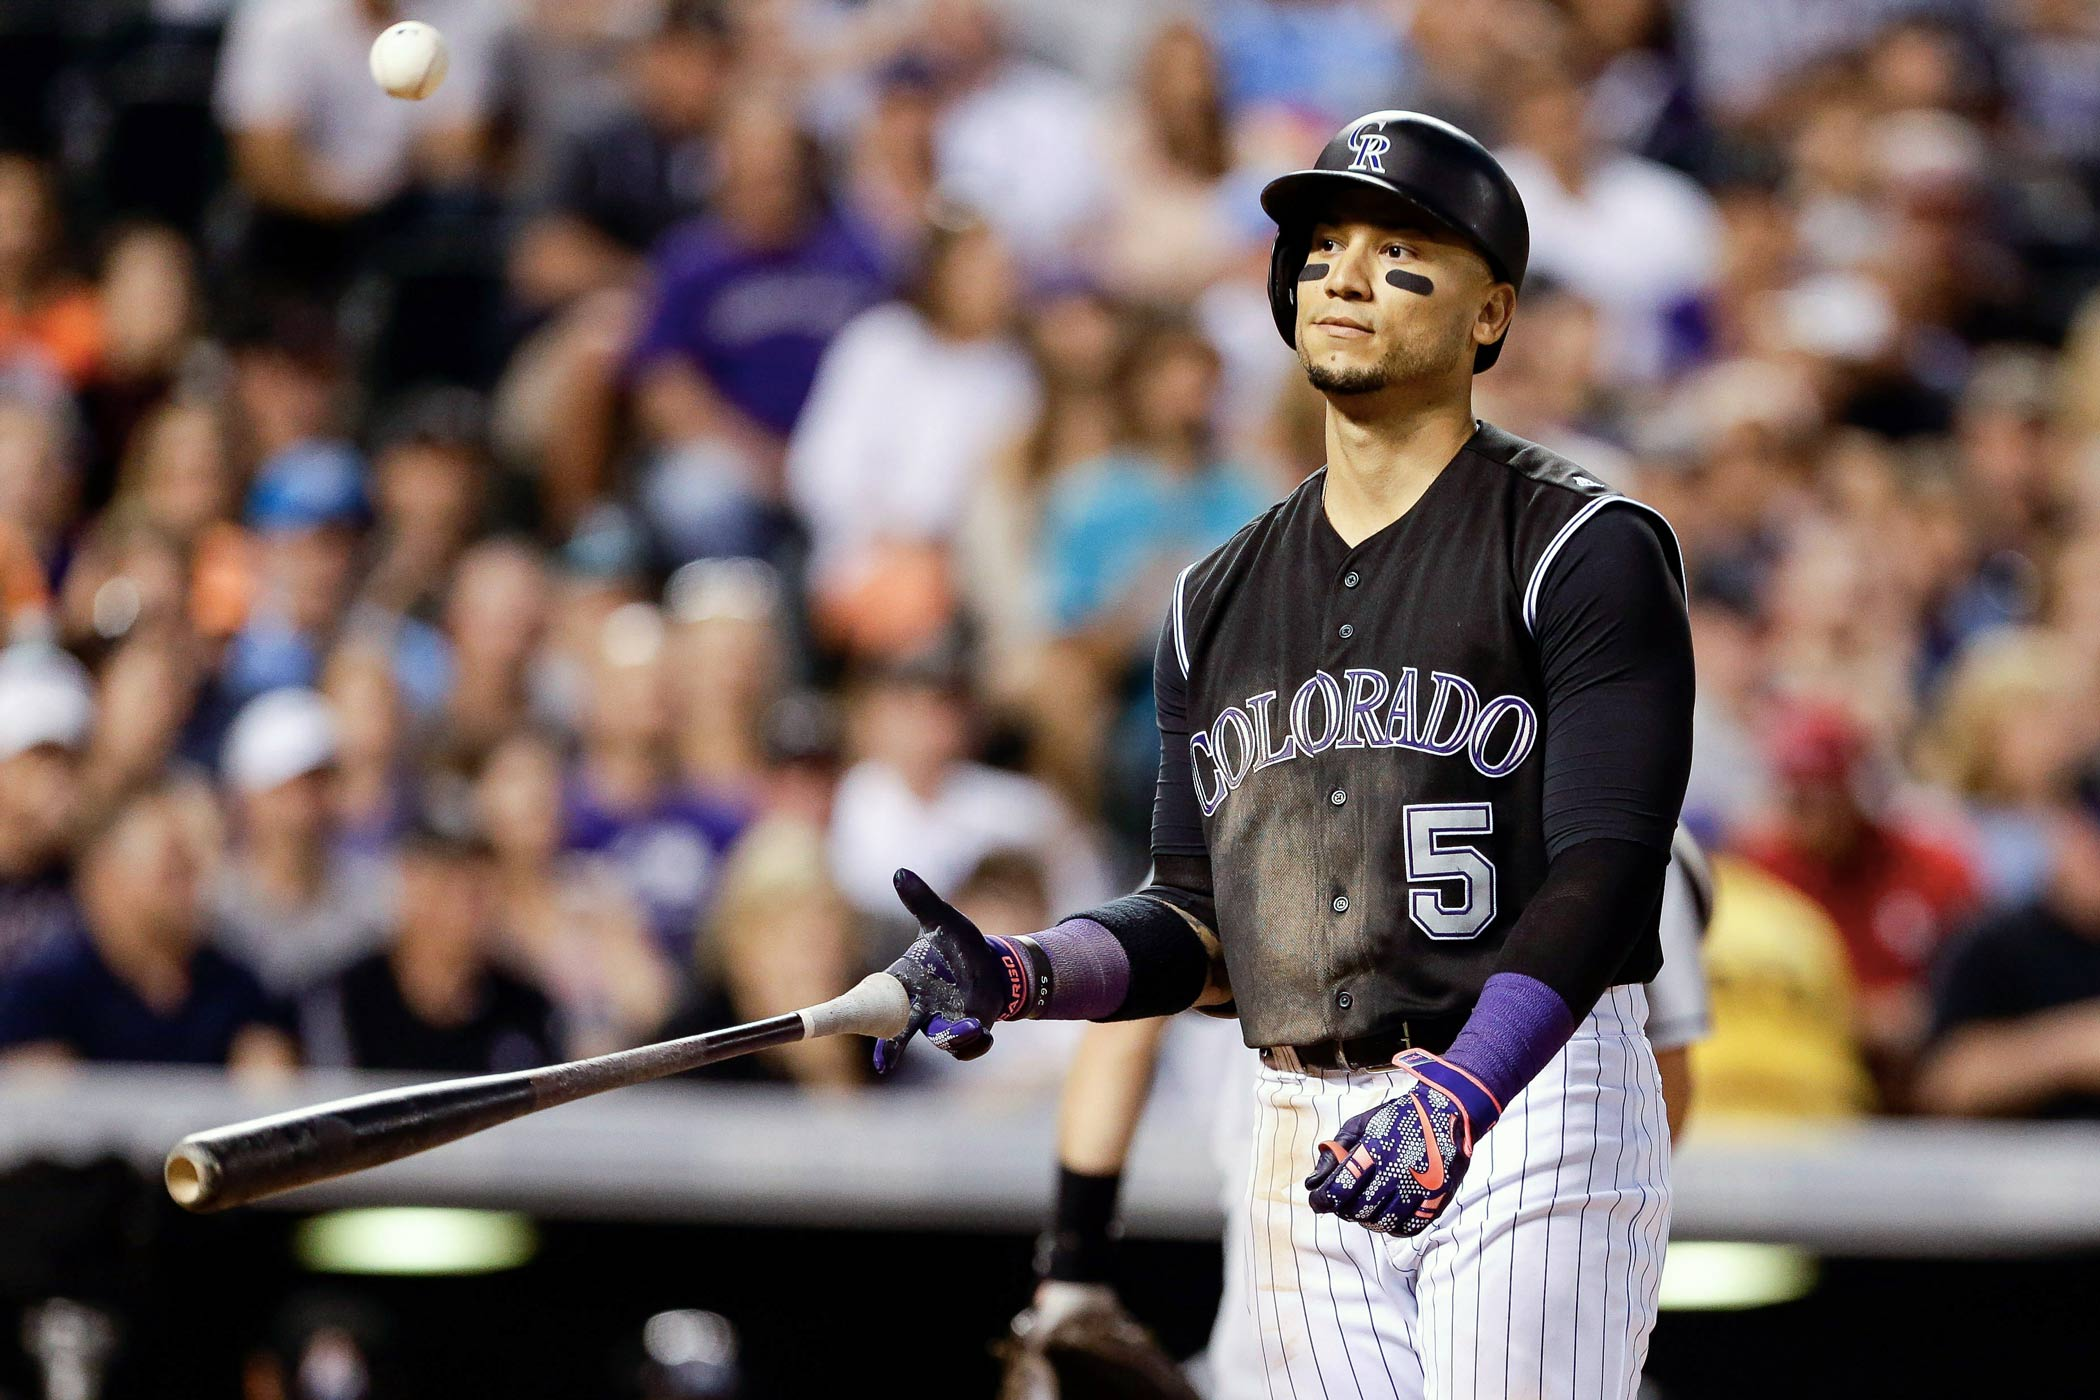 MLB-Professional-Athlete-Relocation-TalkToPaul-Luxury-Real-Estate-2